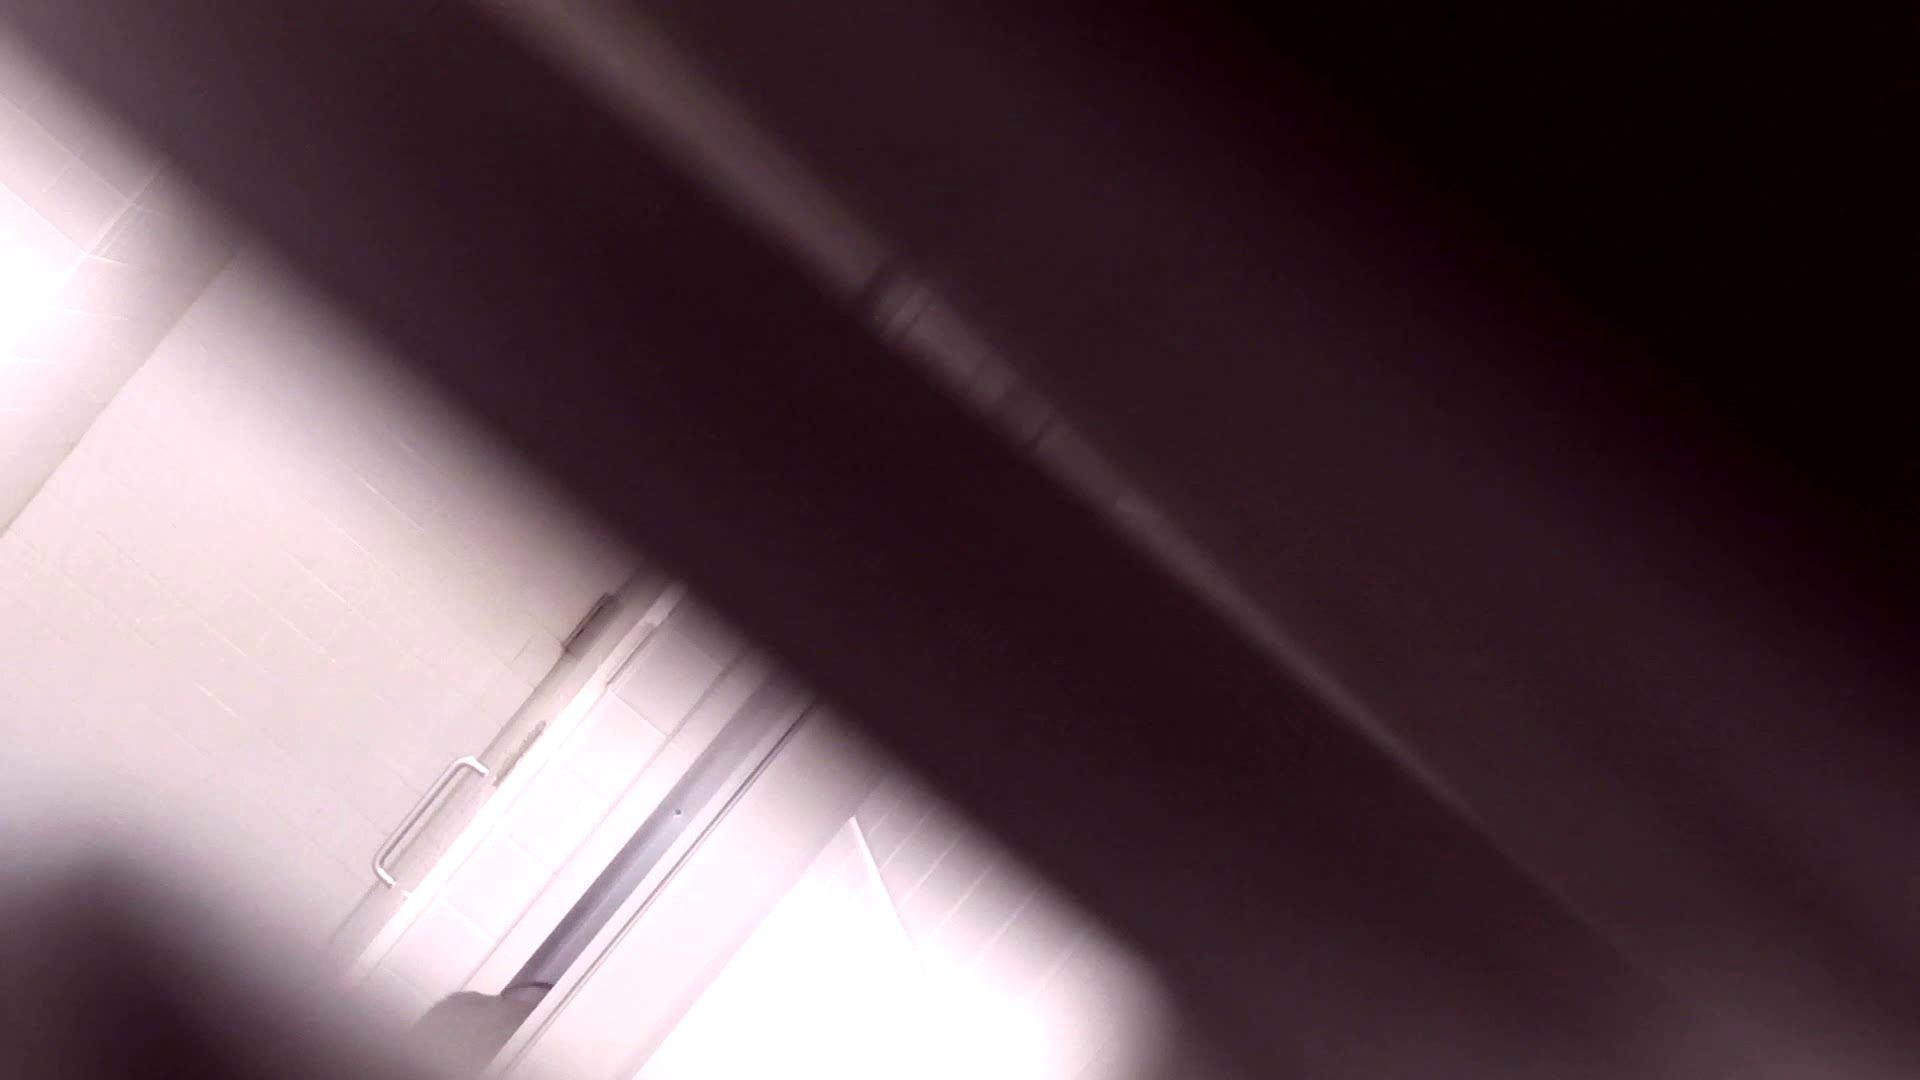 vol.15 命がけ潜伏洗面所! 肌荒れ注意報!! プライベート 隠し撮りすけべAV動画紹介 102画像 59